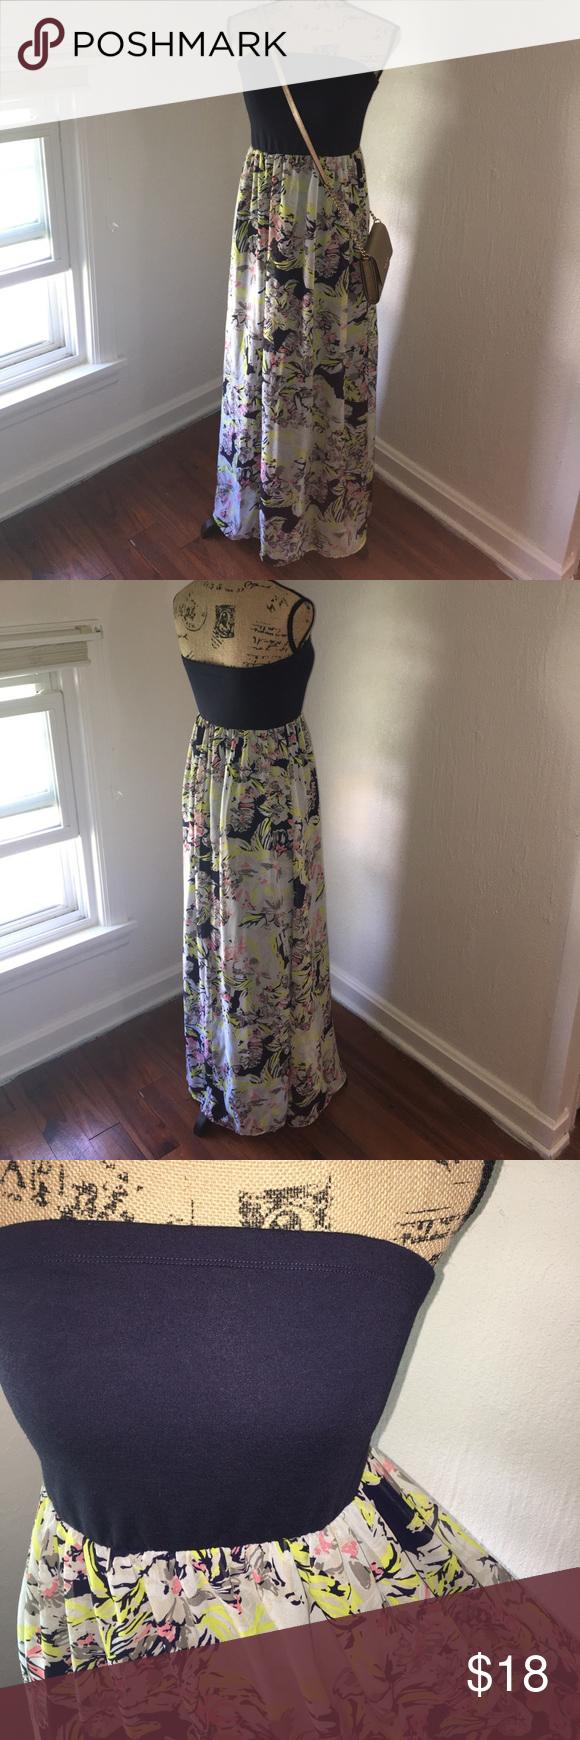 Xhilaration Maxi Dress Xhilaration Long Maxi Dress Juniors Size Medium So Beautiful And The Perfect Summer Dress I Long Maxi Dress Maxi Dress Summer Dresses [ 1740 x 580 Pixel ]